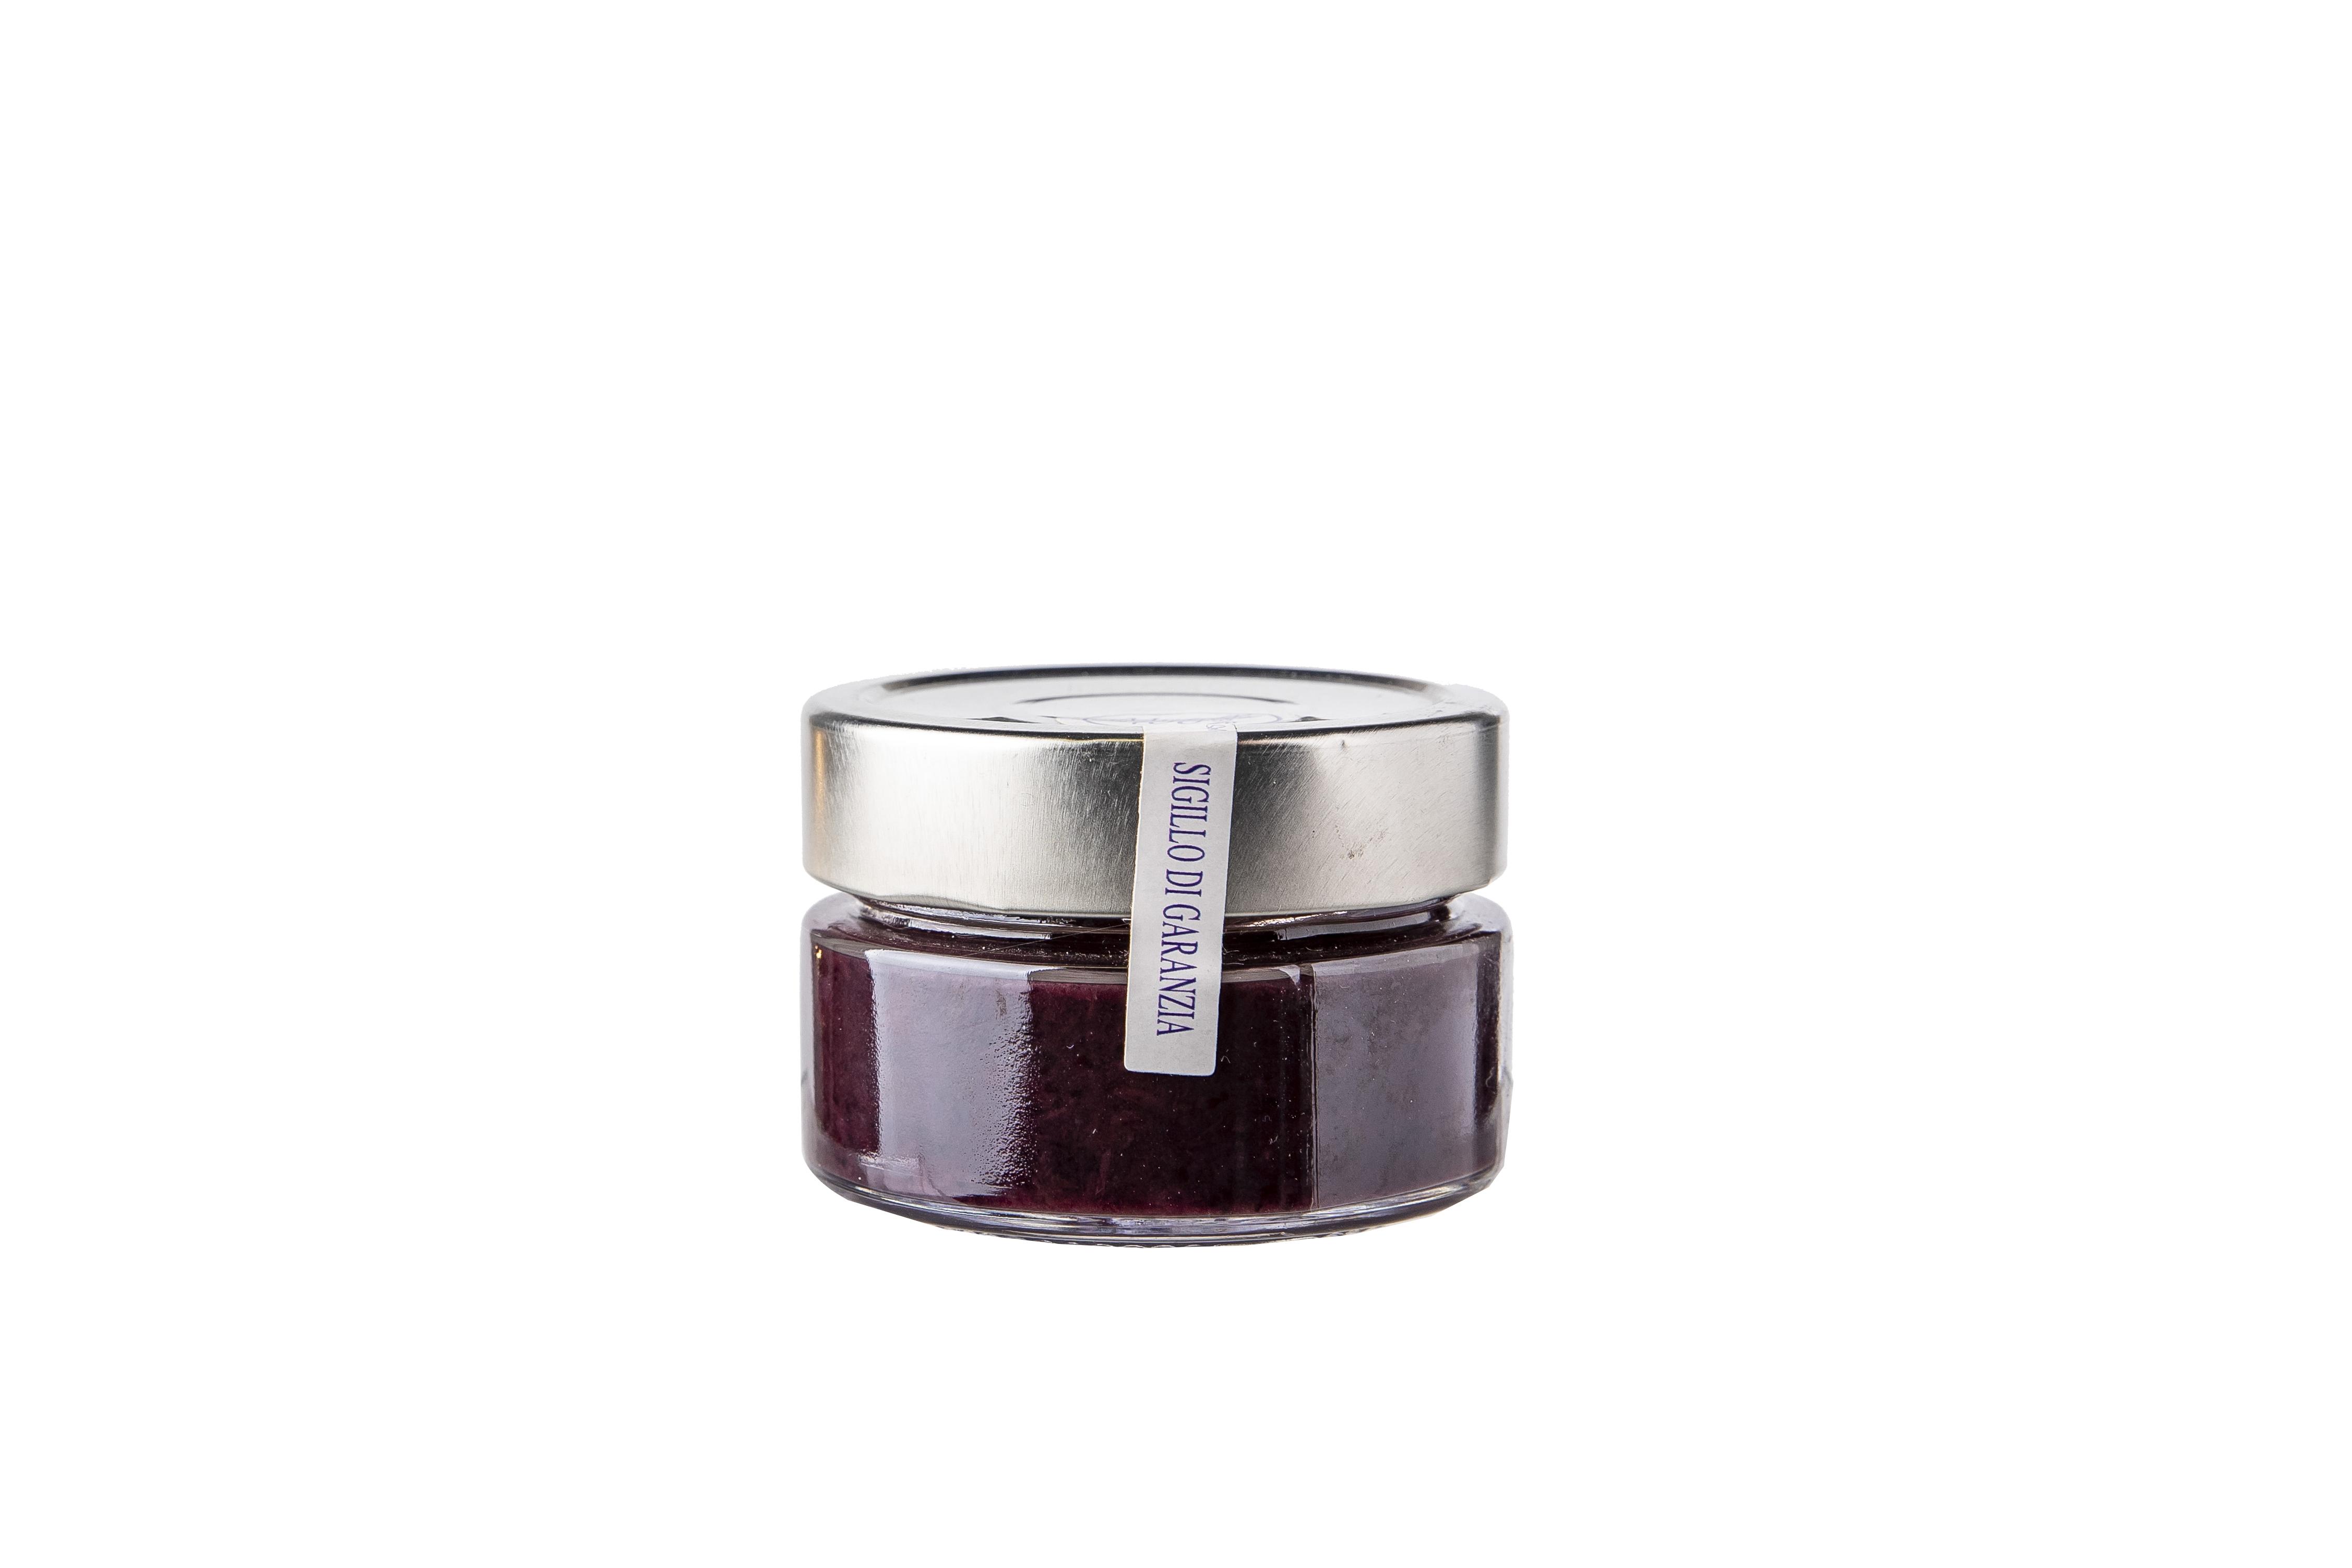 Confettura di mirtilli 100% senza zucchero 100gr